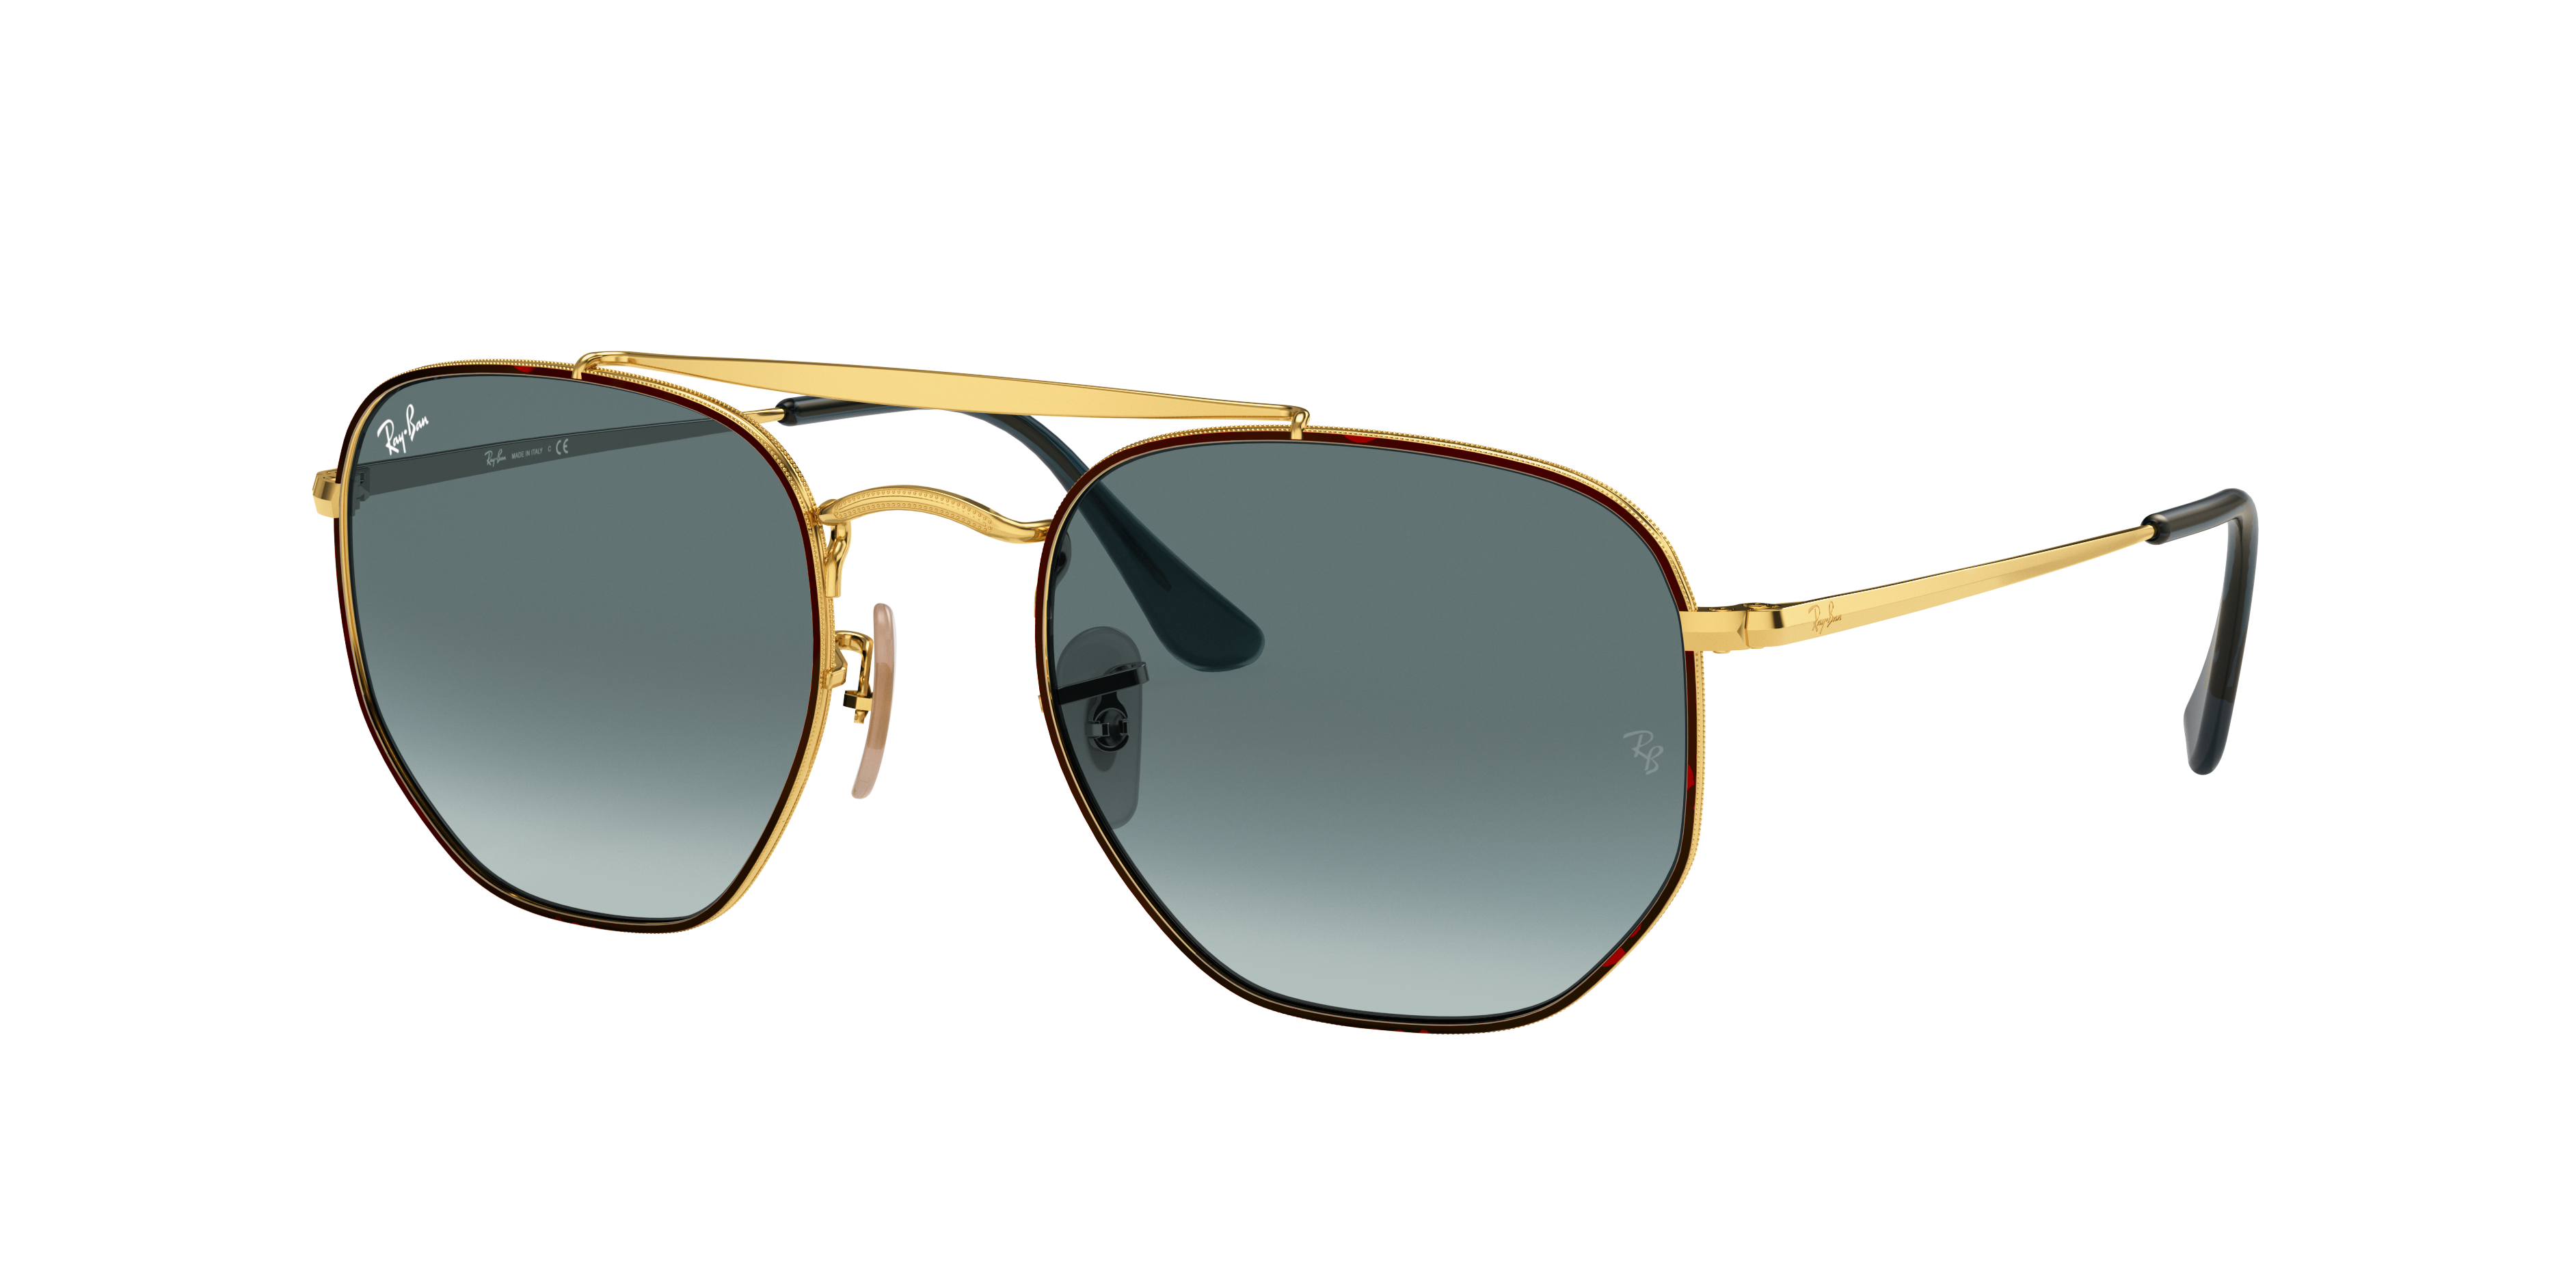 Ray-Ban Marshal Gold, Blue Lenses - RB3648